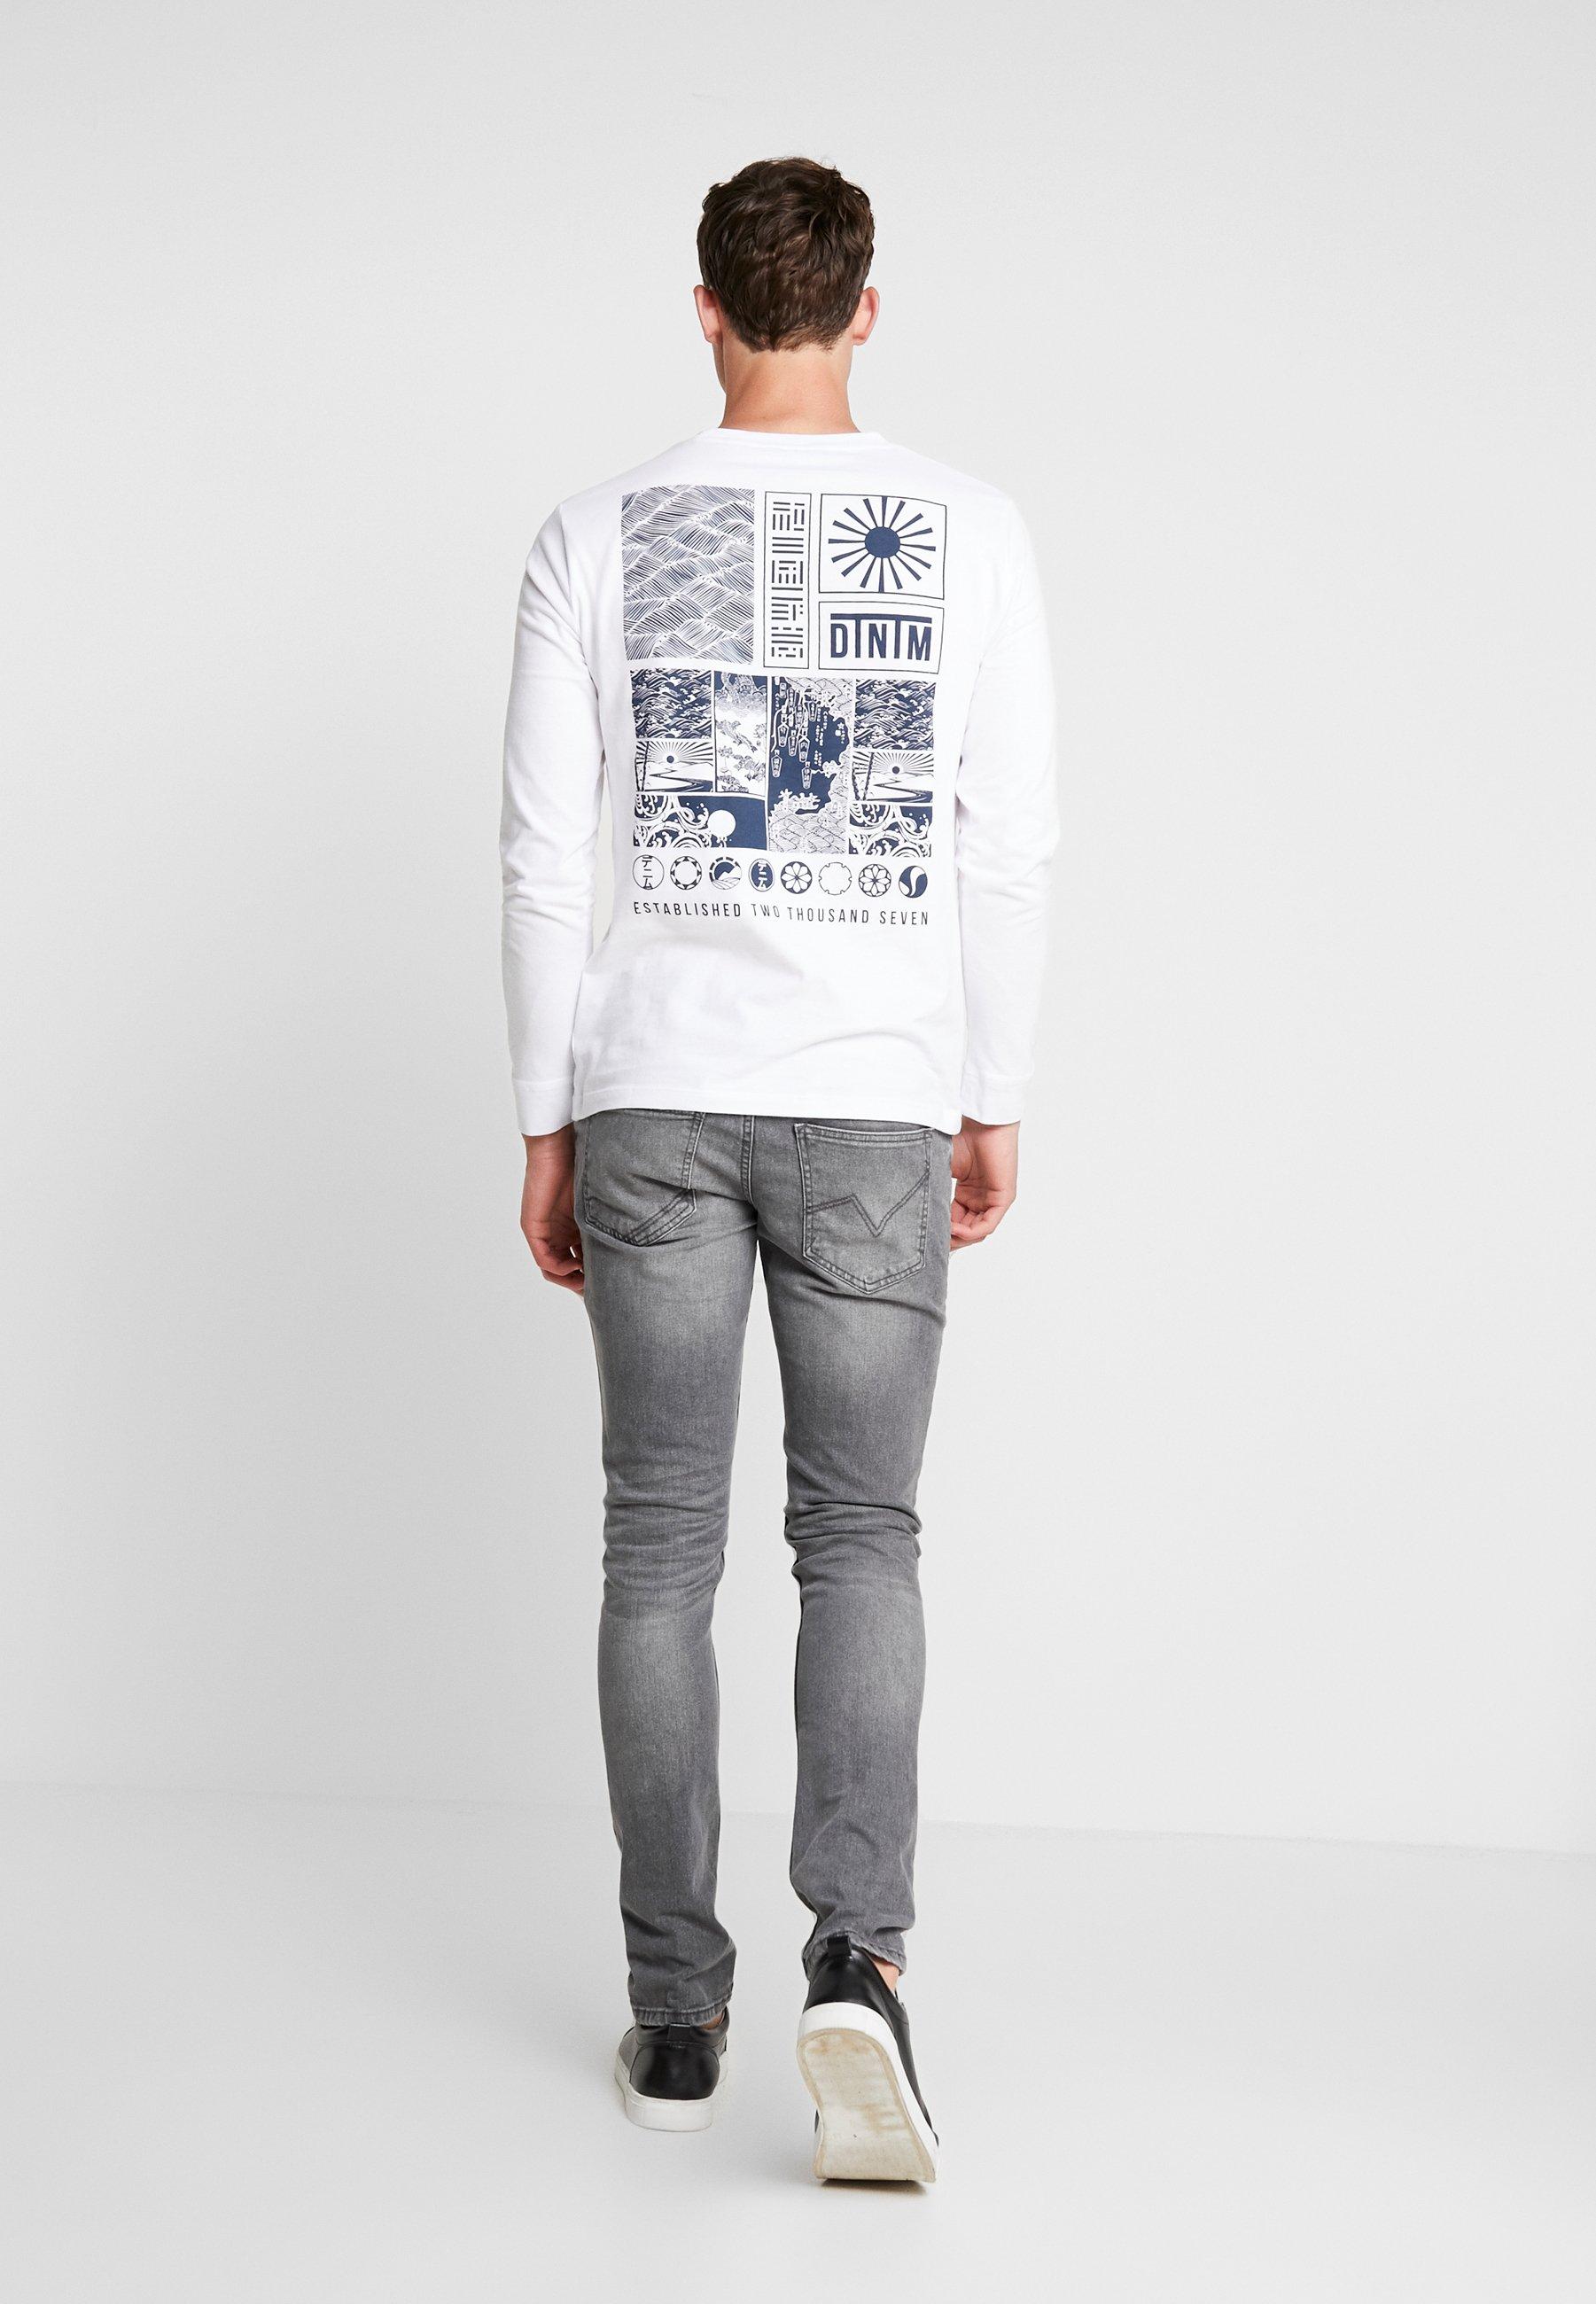 Grey Denim Stone Culver Used Skinny Tom Tailor Price StarterJeans Mid rdeQCxBoW